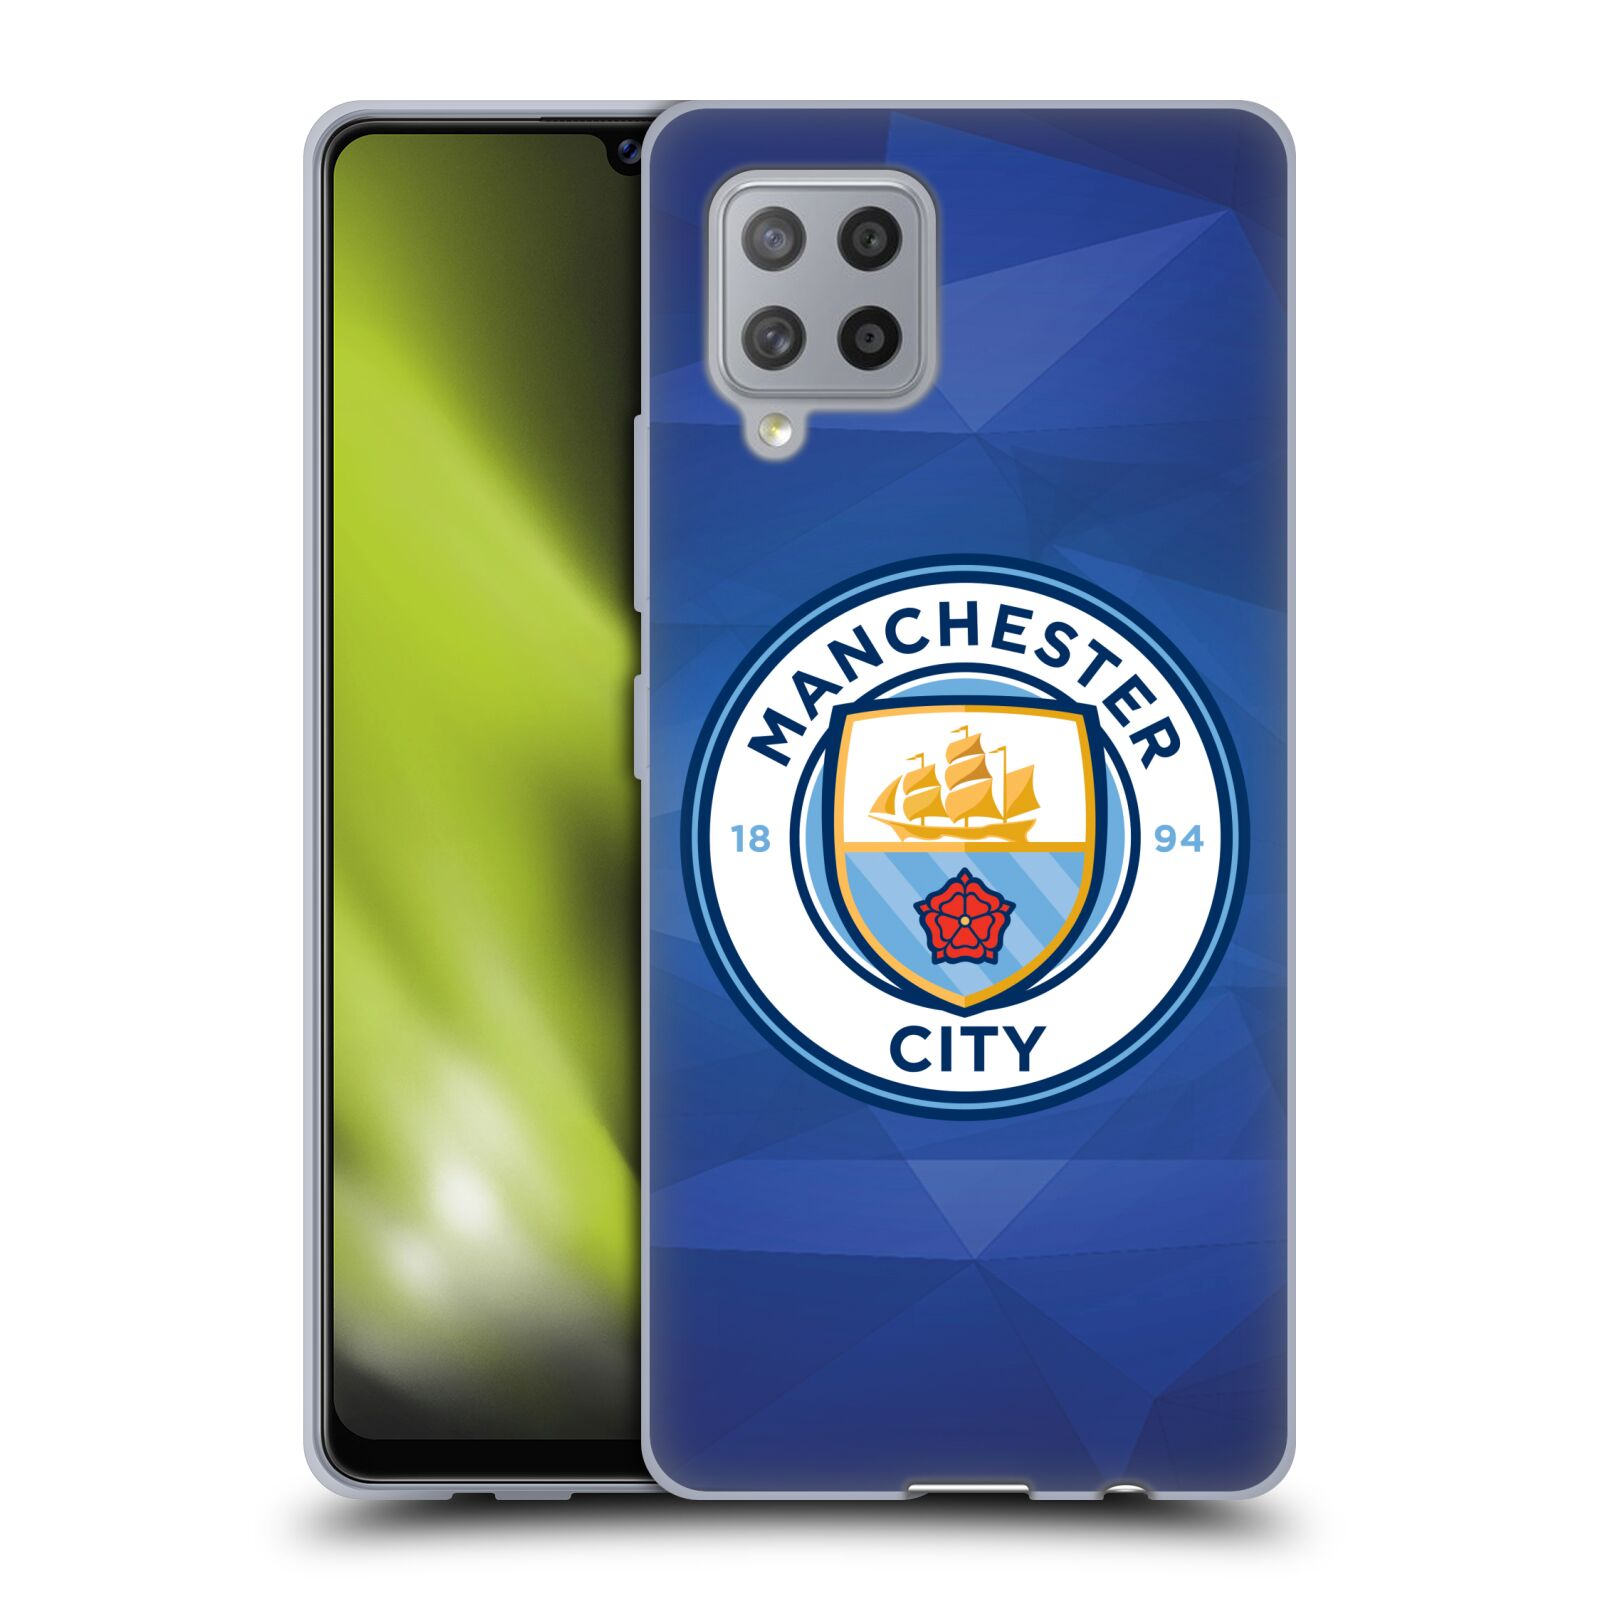 Silikonové pouzdro na mobil Samsung Galaxy A42 5G - Head Case - Manchester City FC - Modré nové logo